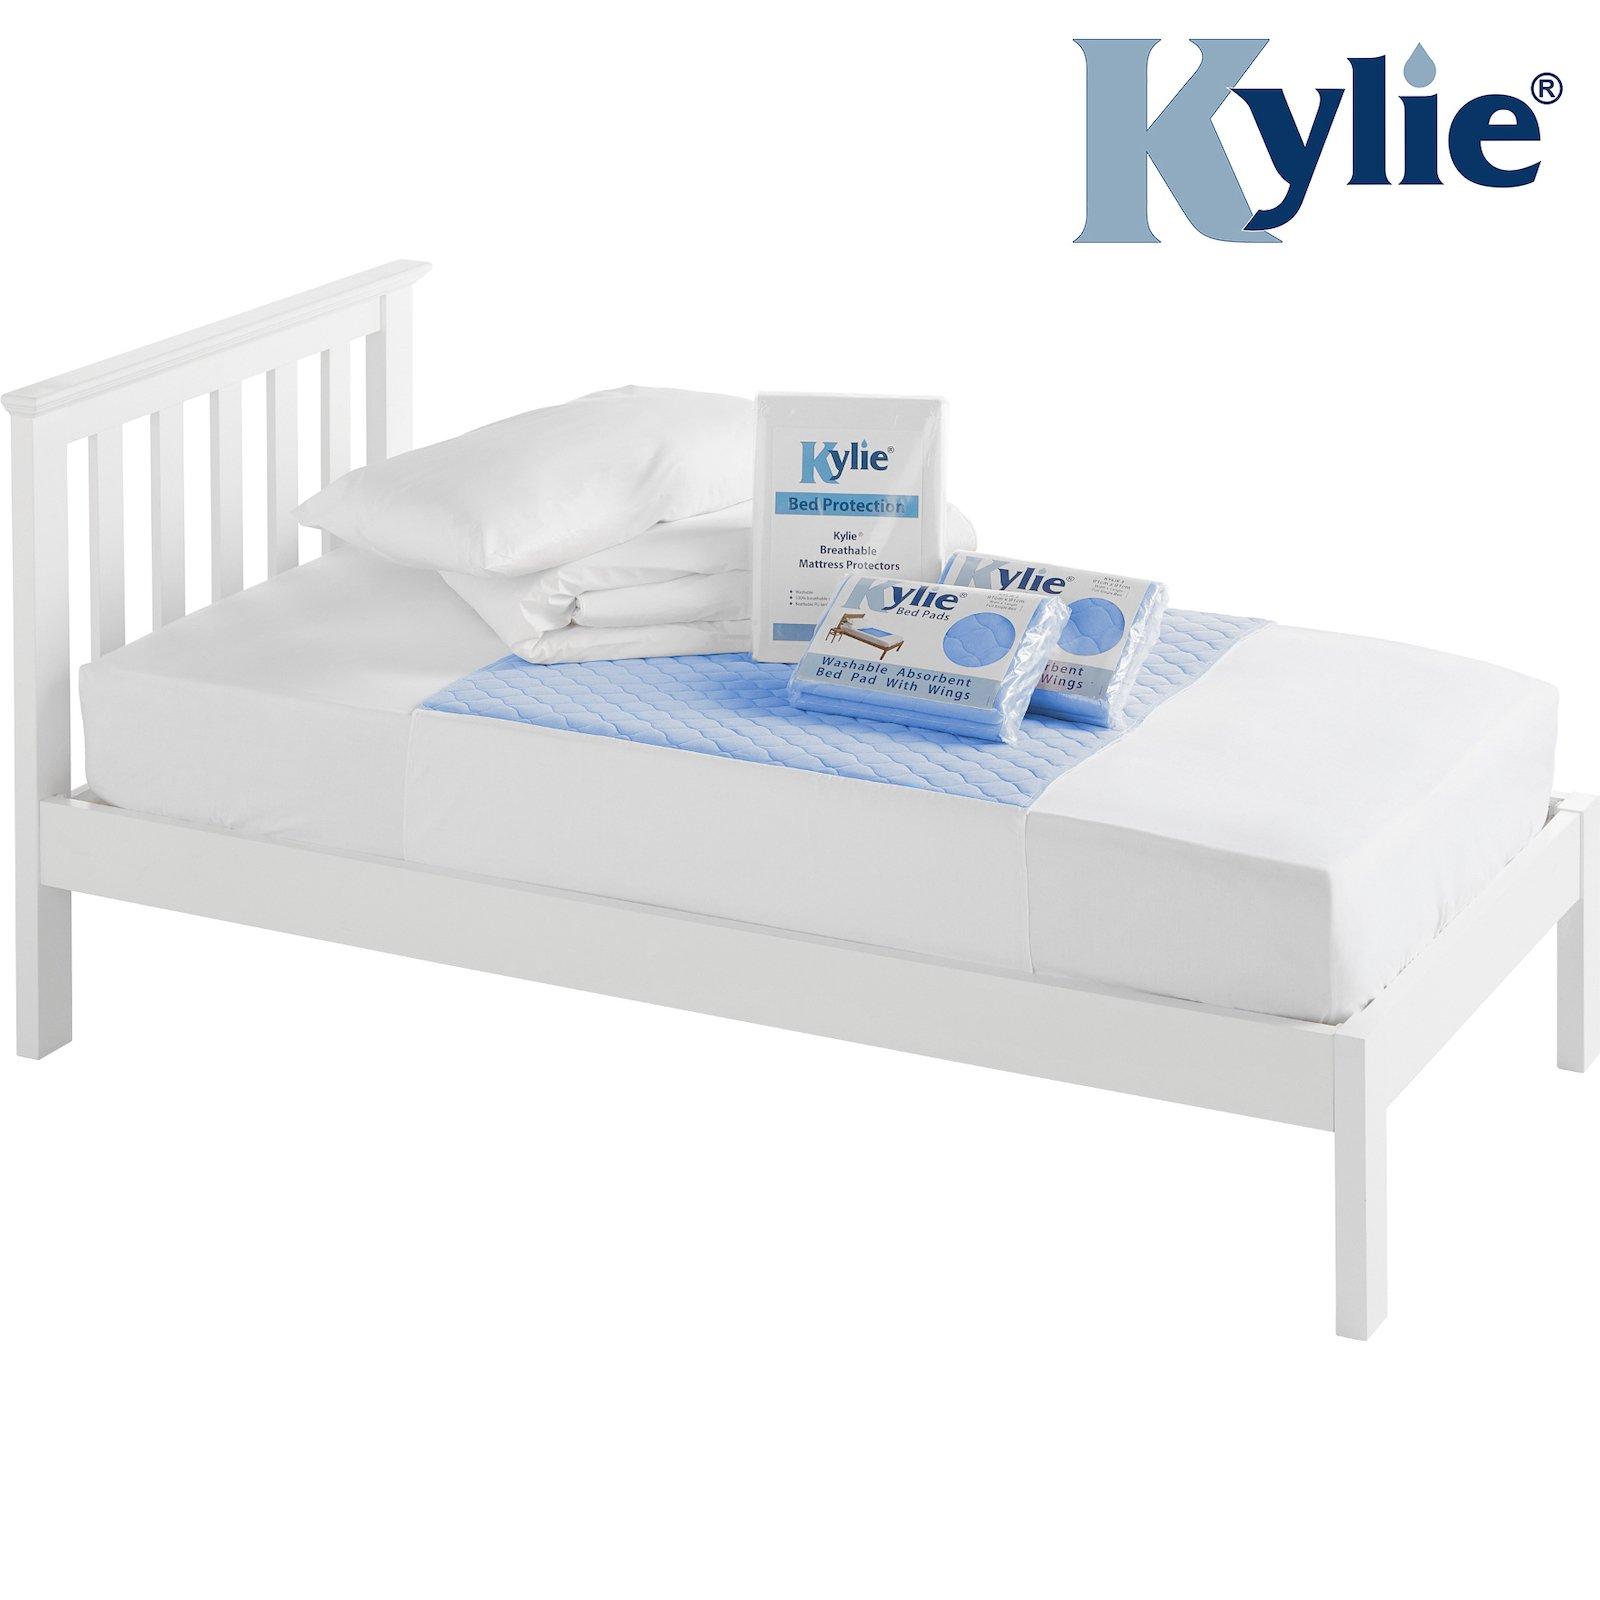 Single Bed Bundle